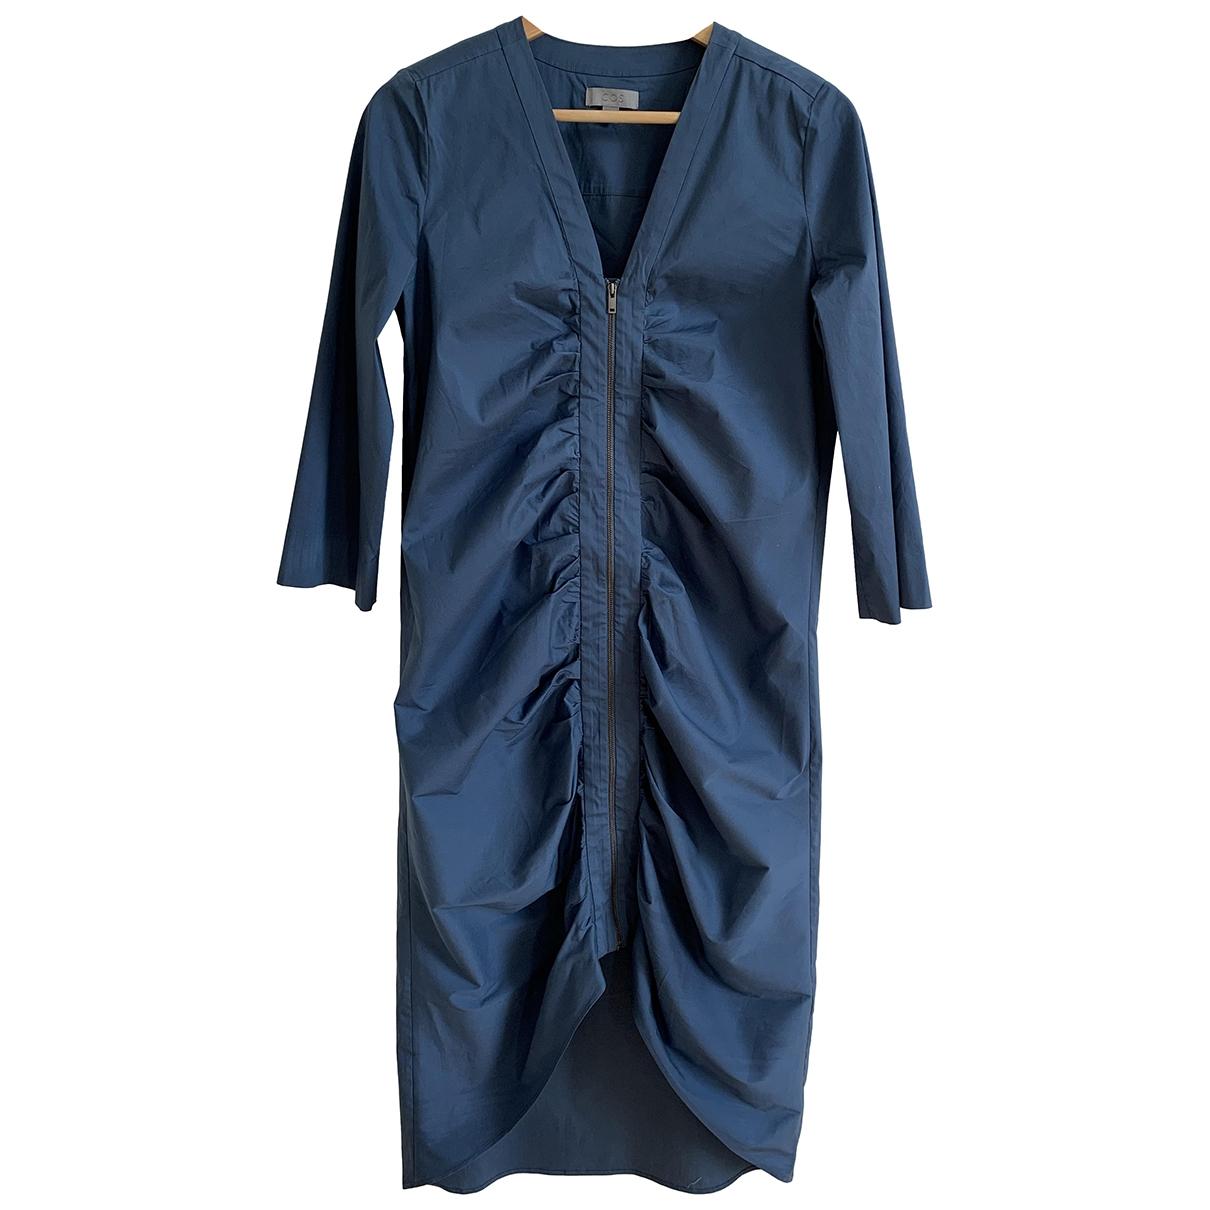 Cos \N Blue Cotton - elasthane dress for Women 36 FR